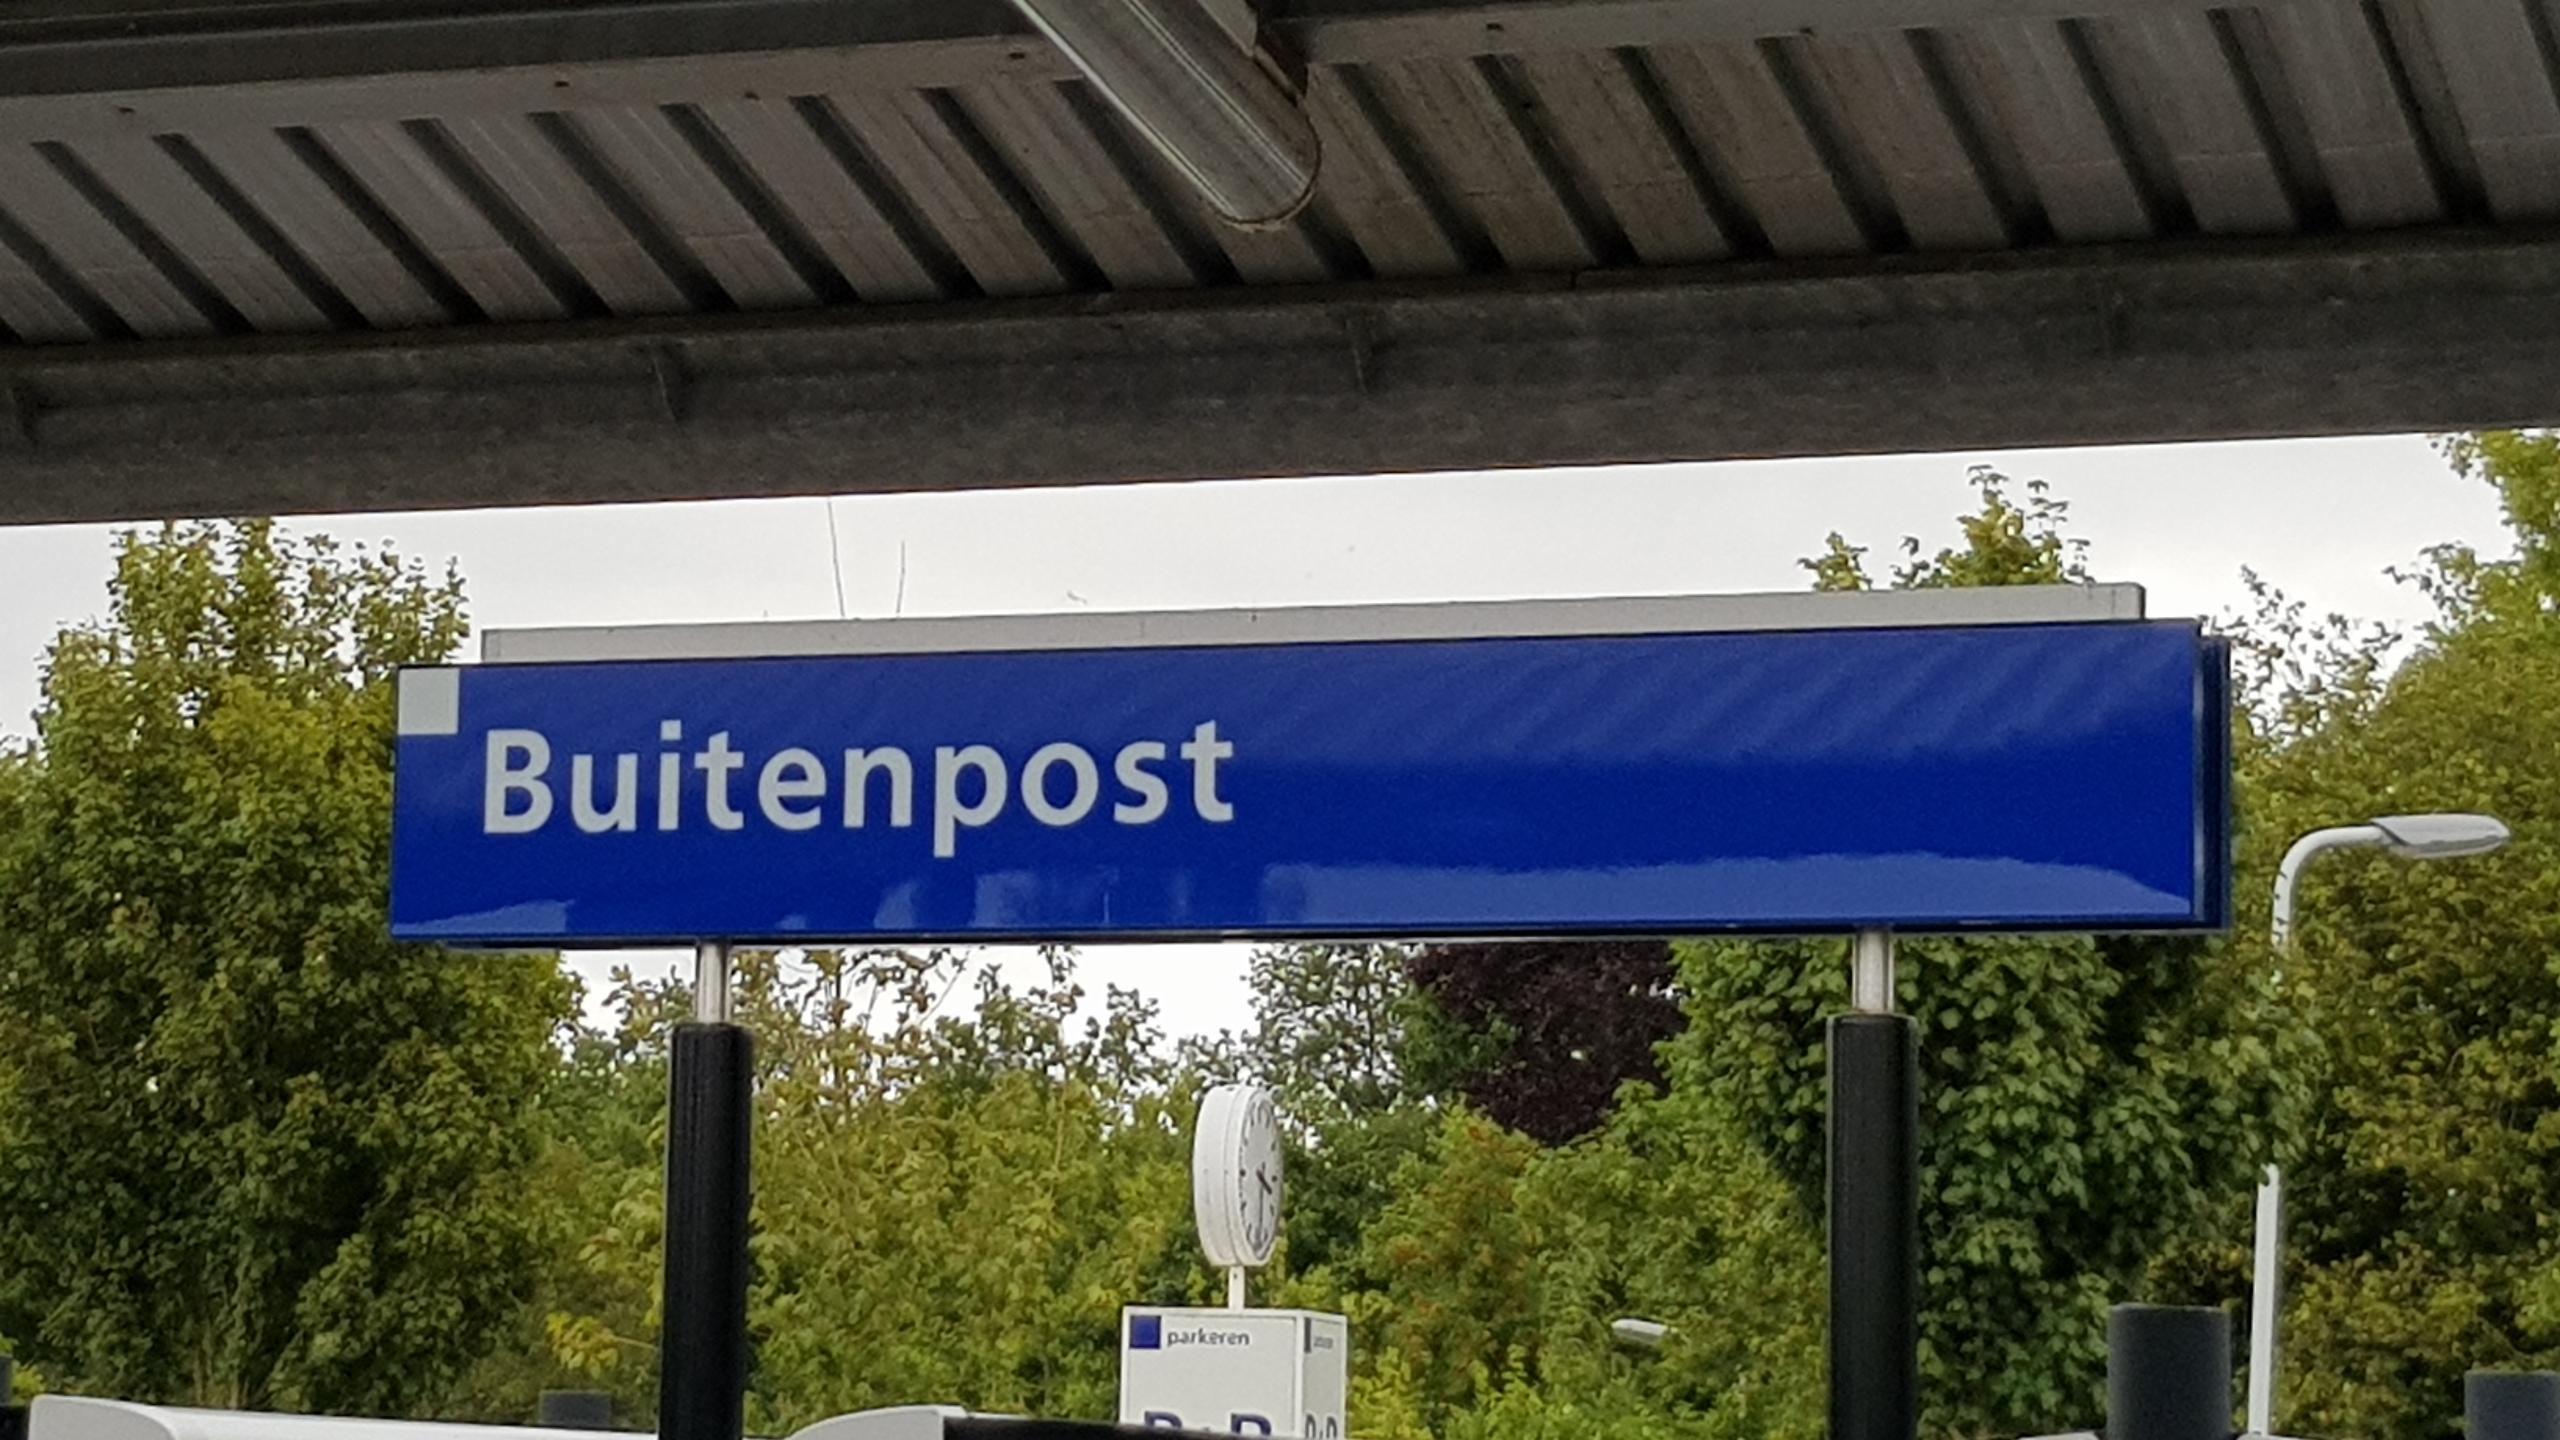 Station Buitenpost